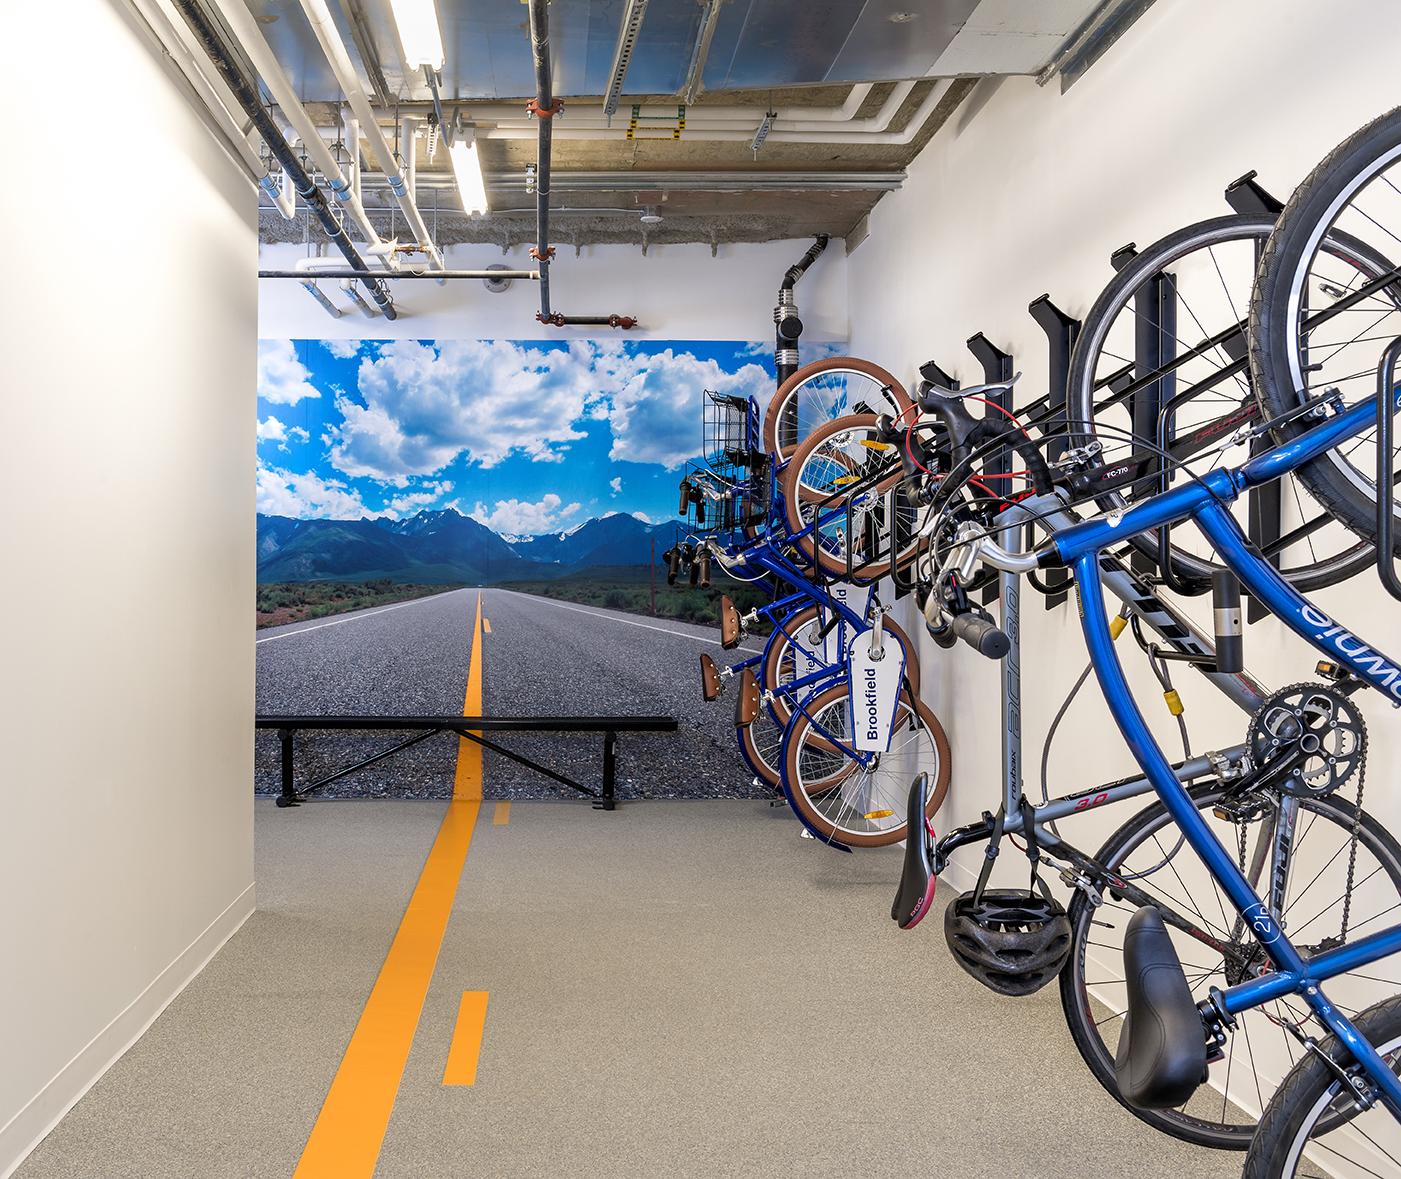 A bike storage room